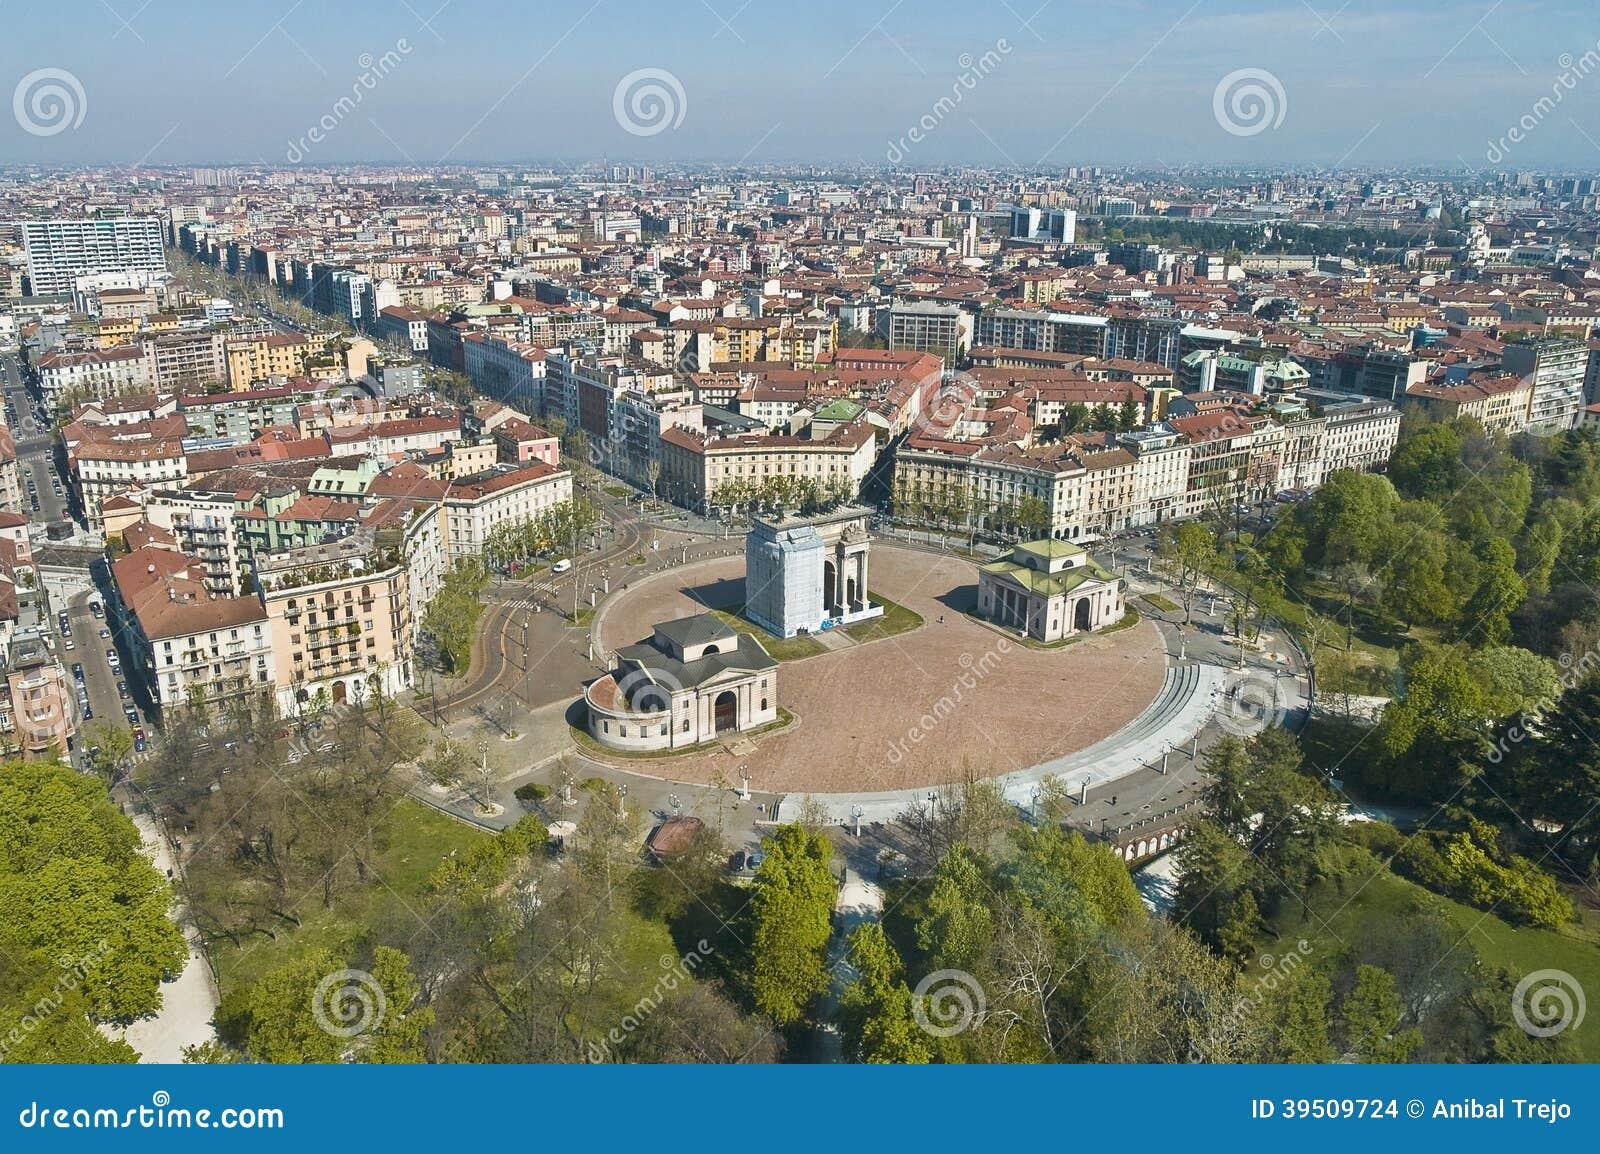 Arco della Pace at Milan, Italy